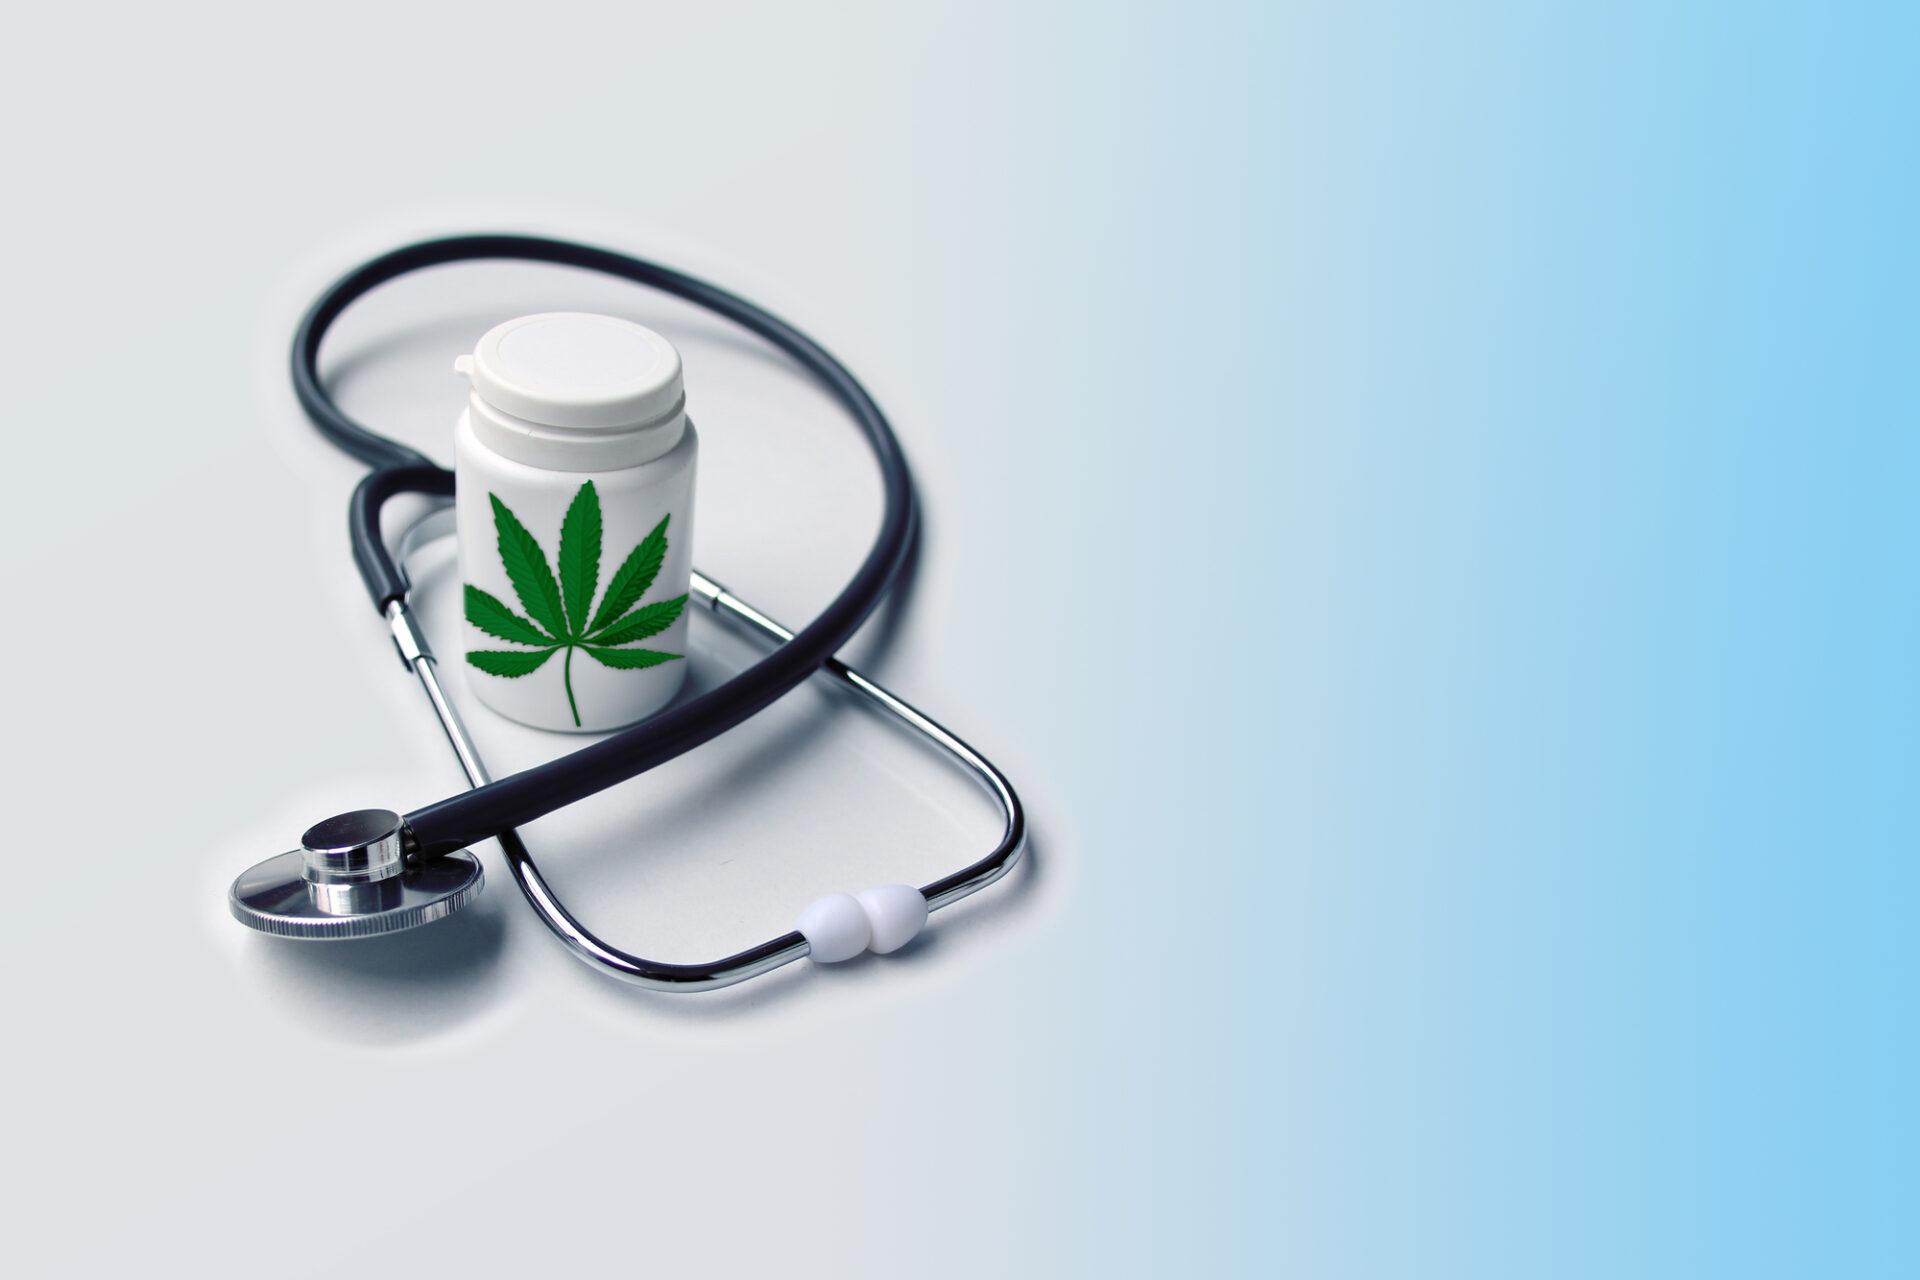 Medical marijuana and insomnia